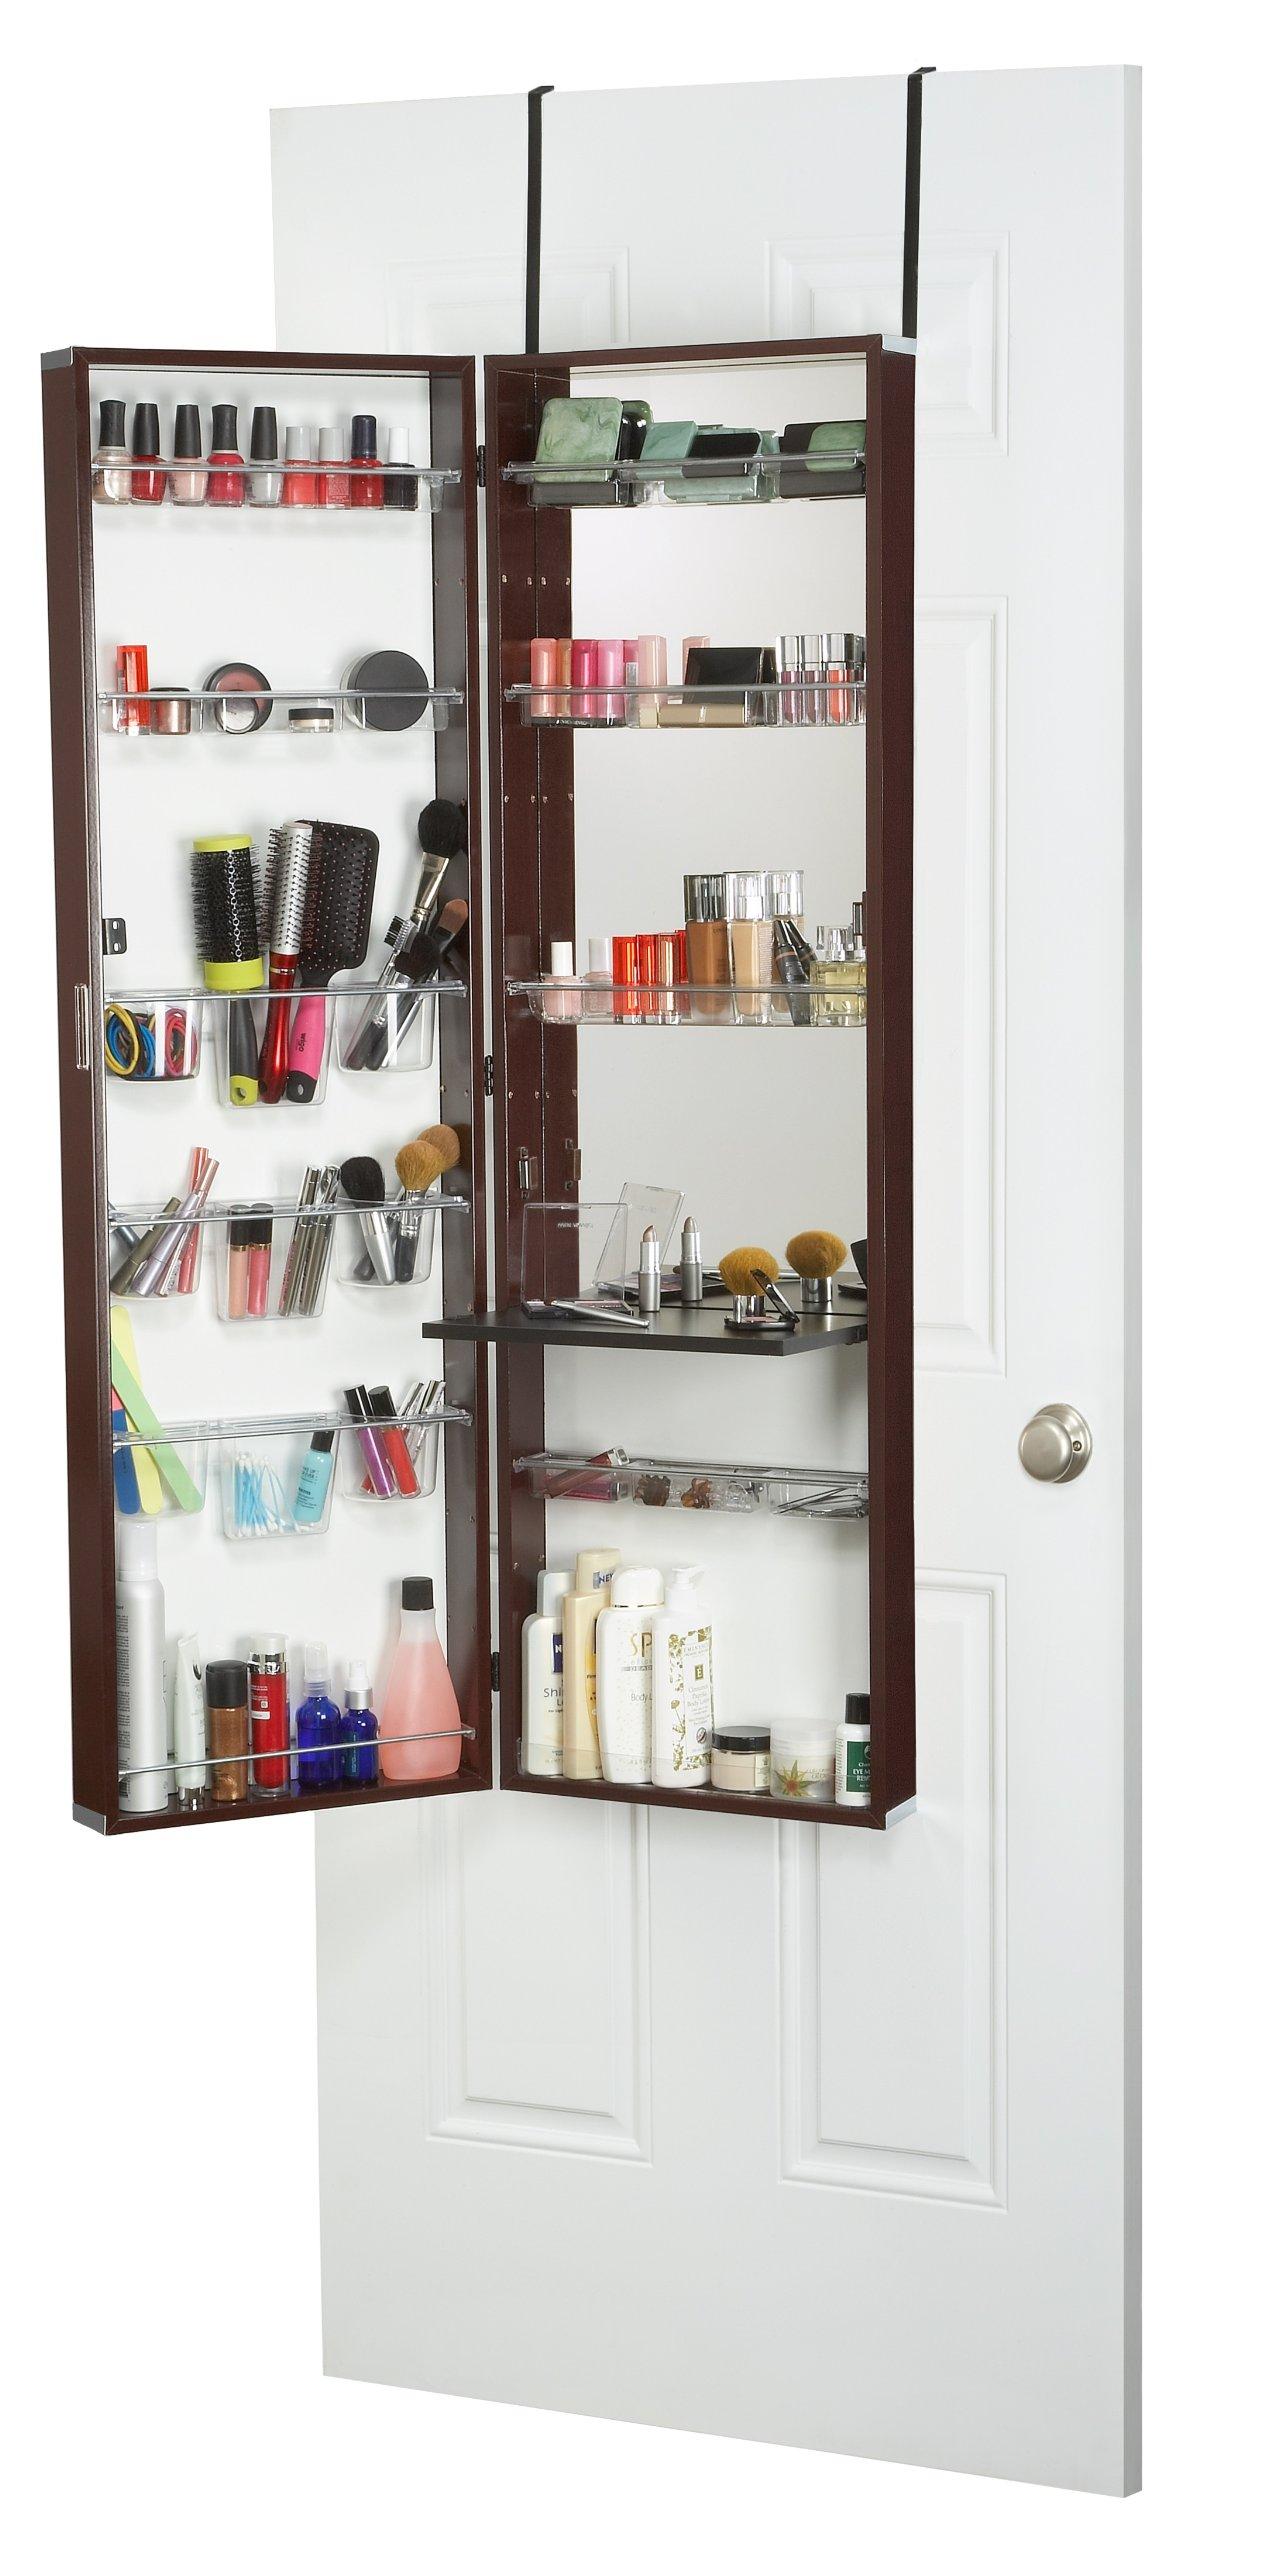 Mirrotek Over The Door Beauty Armoire and Makeup Organizer by Mirrotek